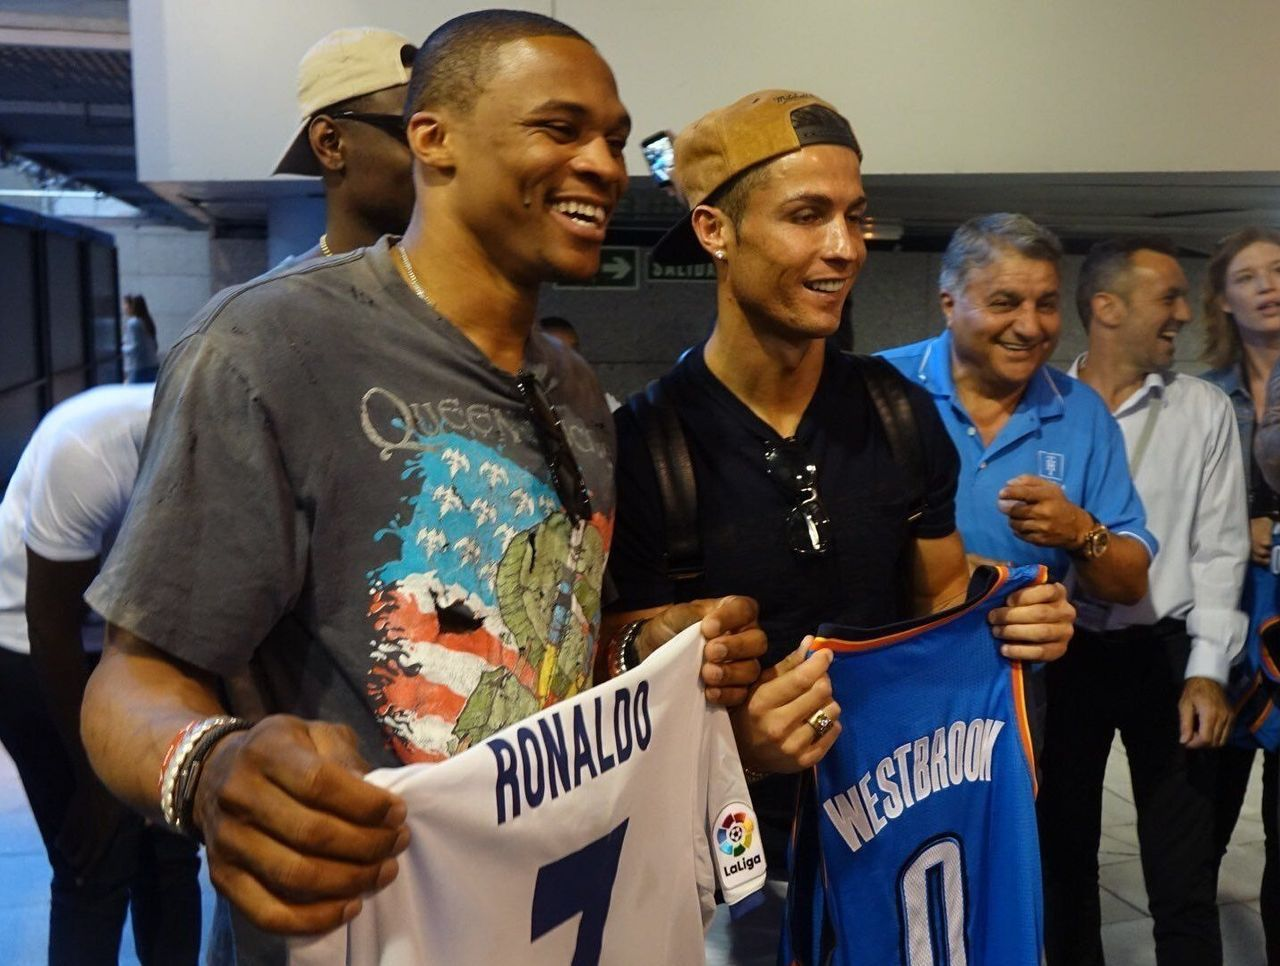 Russell Westbrook Tape La Pose Avec Cristiano Ronaldo